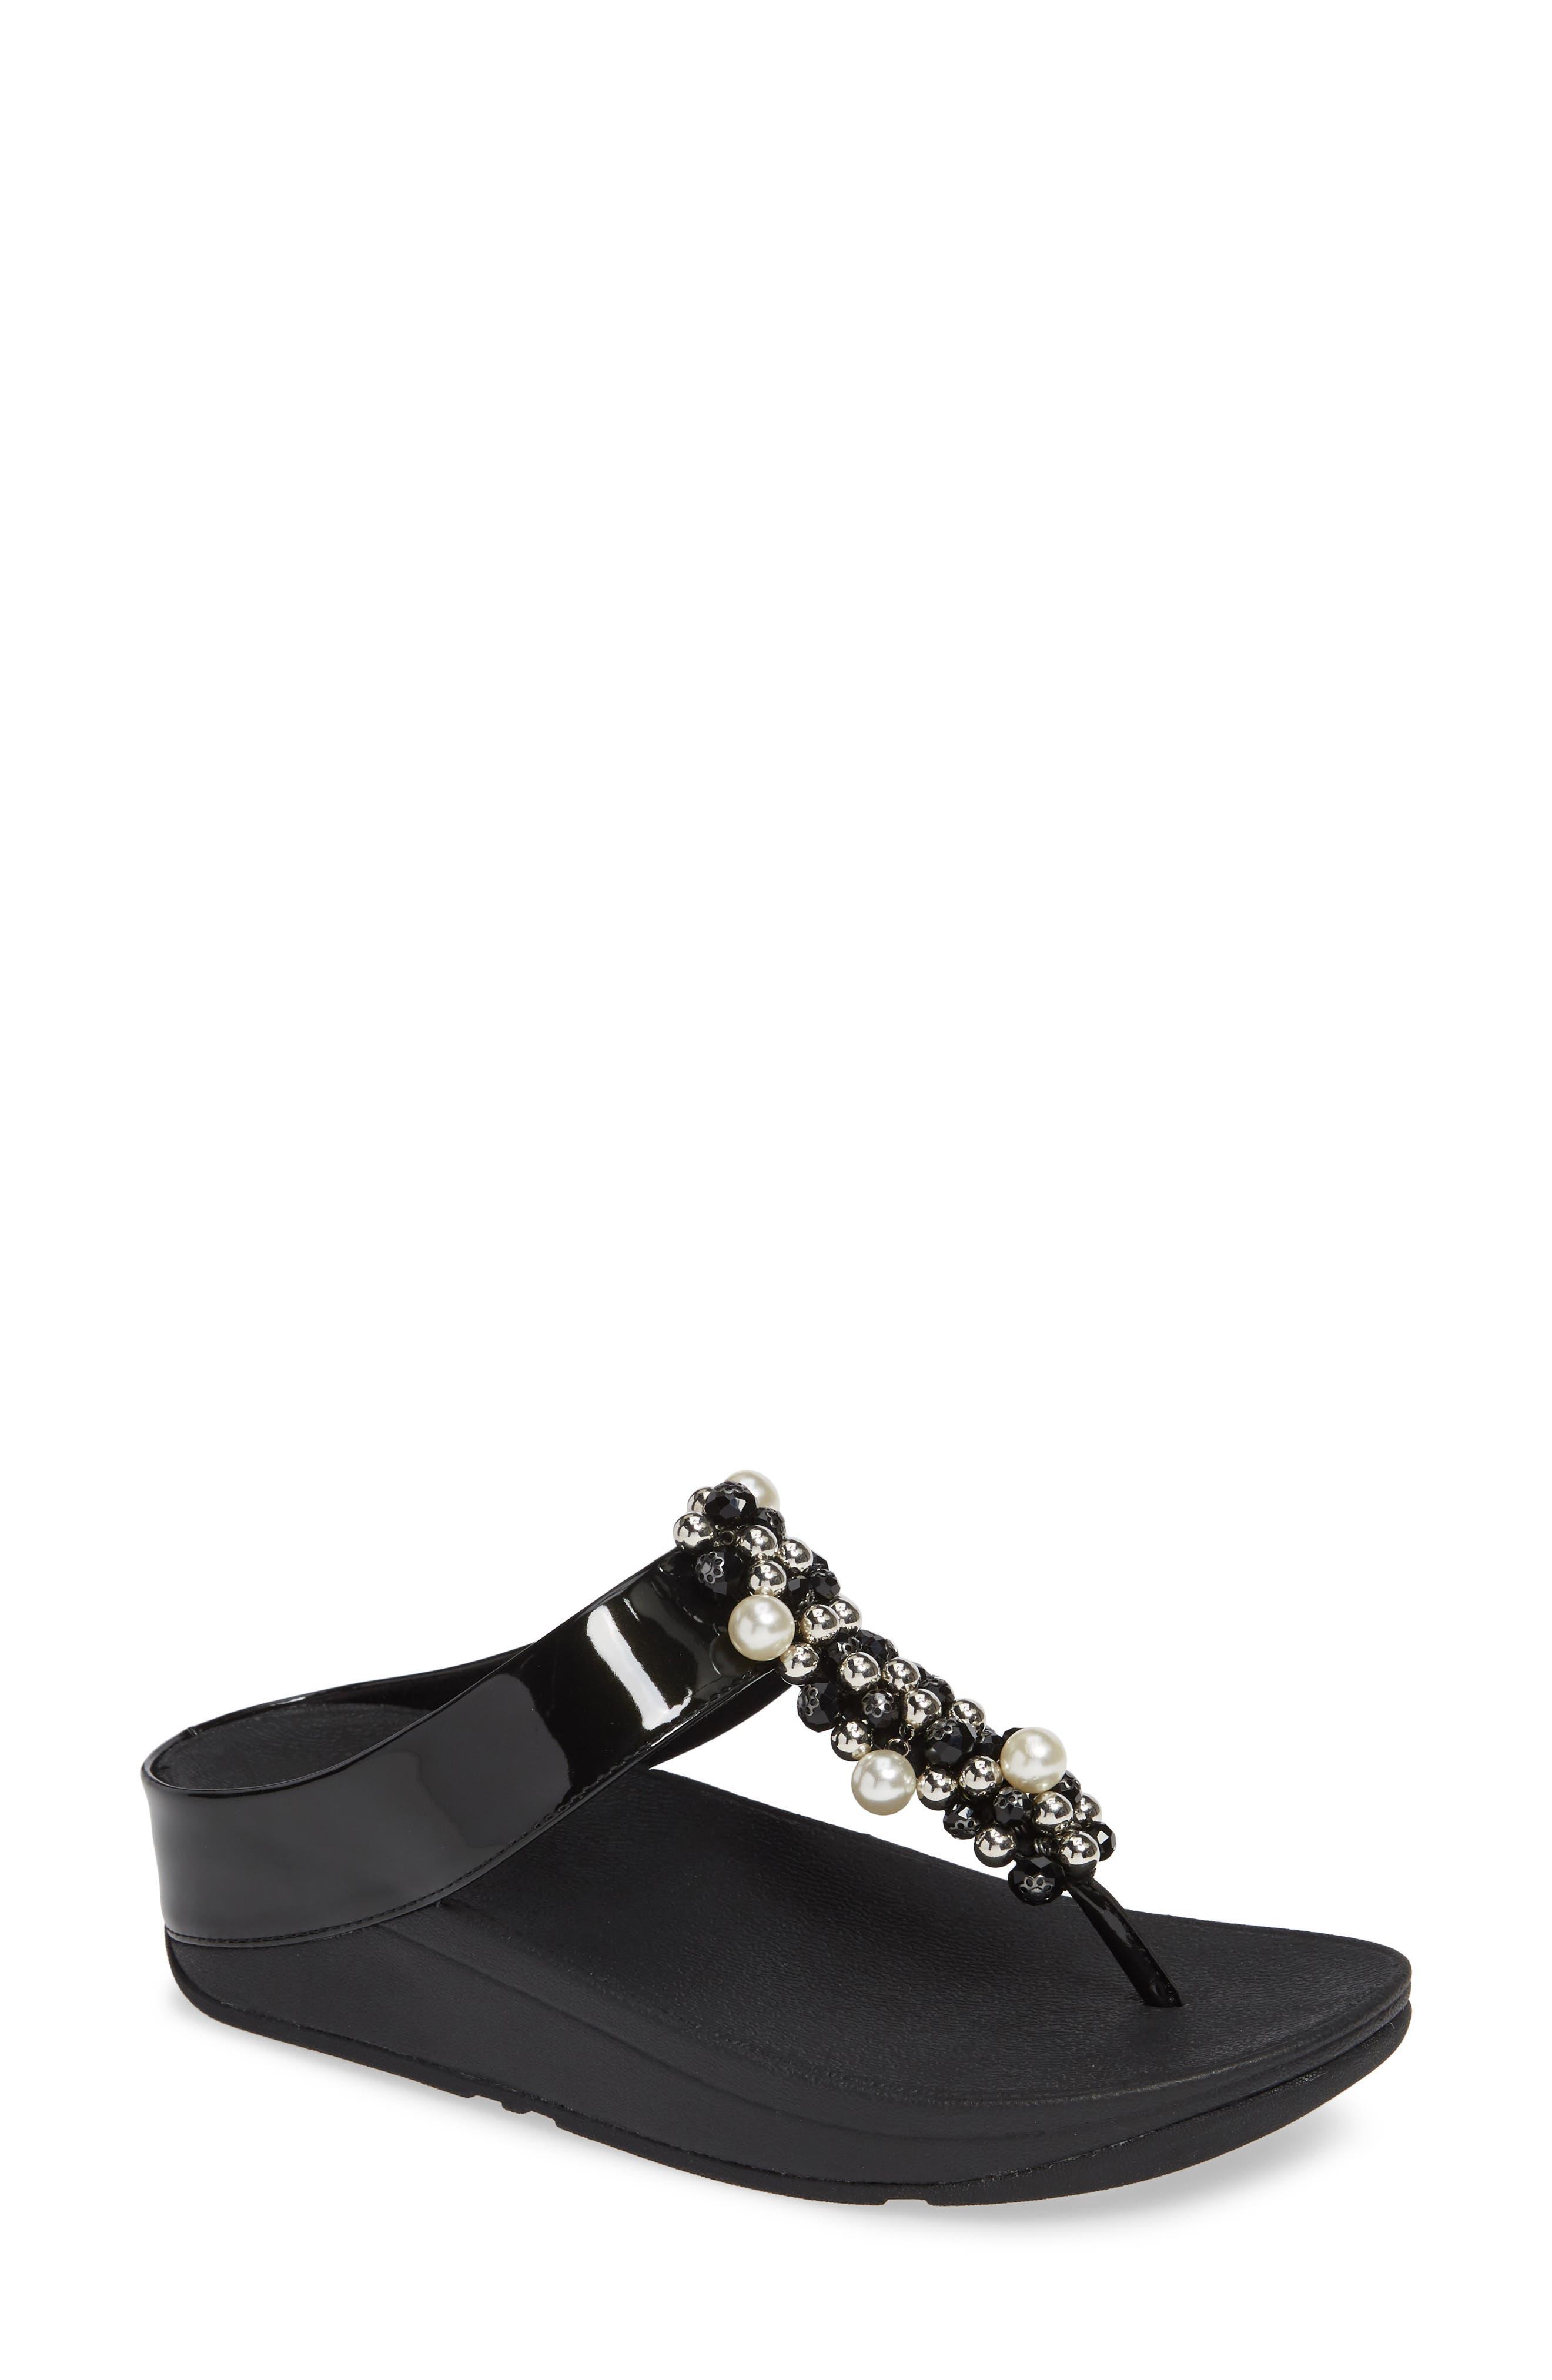 FITFLOP Deco Embellished Flip Flop, Main, color, BLACK FABRIC